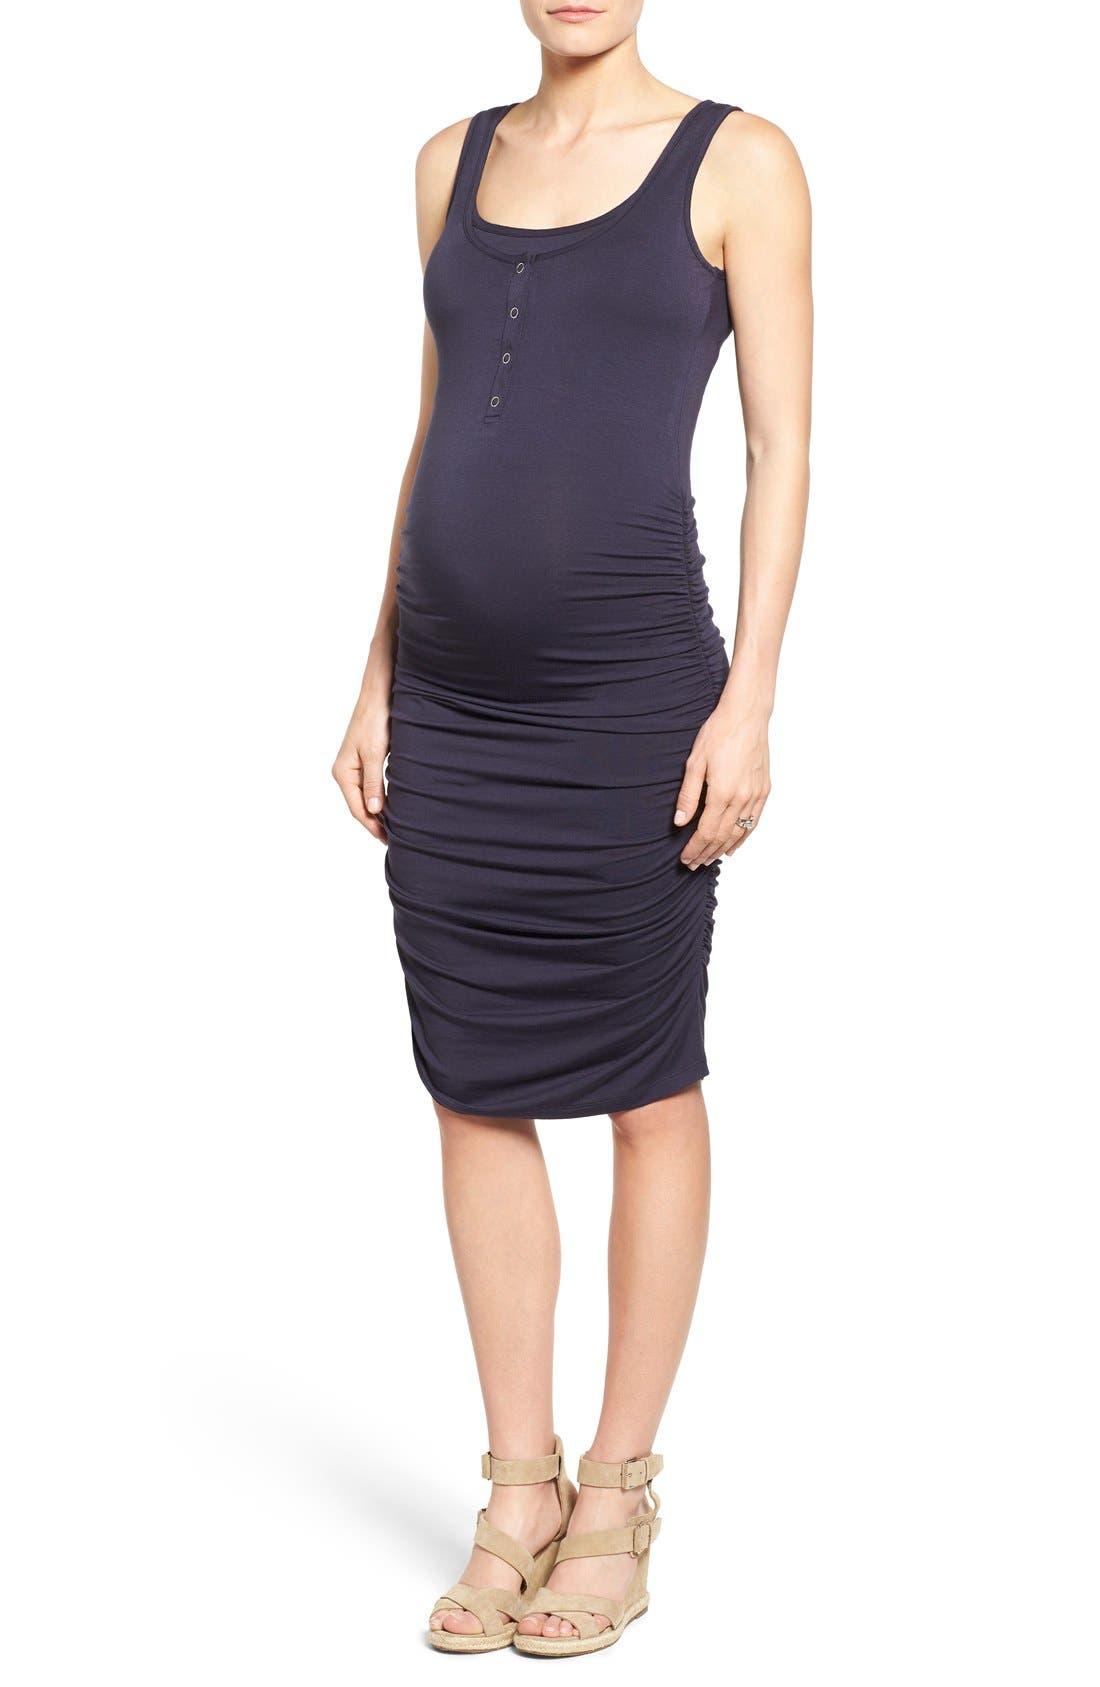 Alternate Image 1 Selected - Nom Maternity Sleeveless Maternity/Nursing Dress